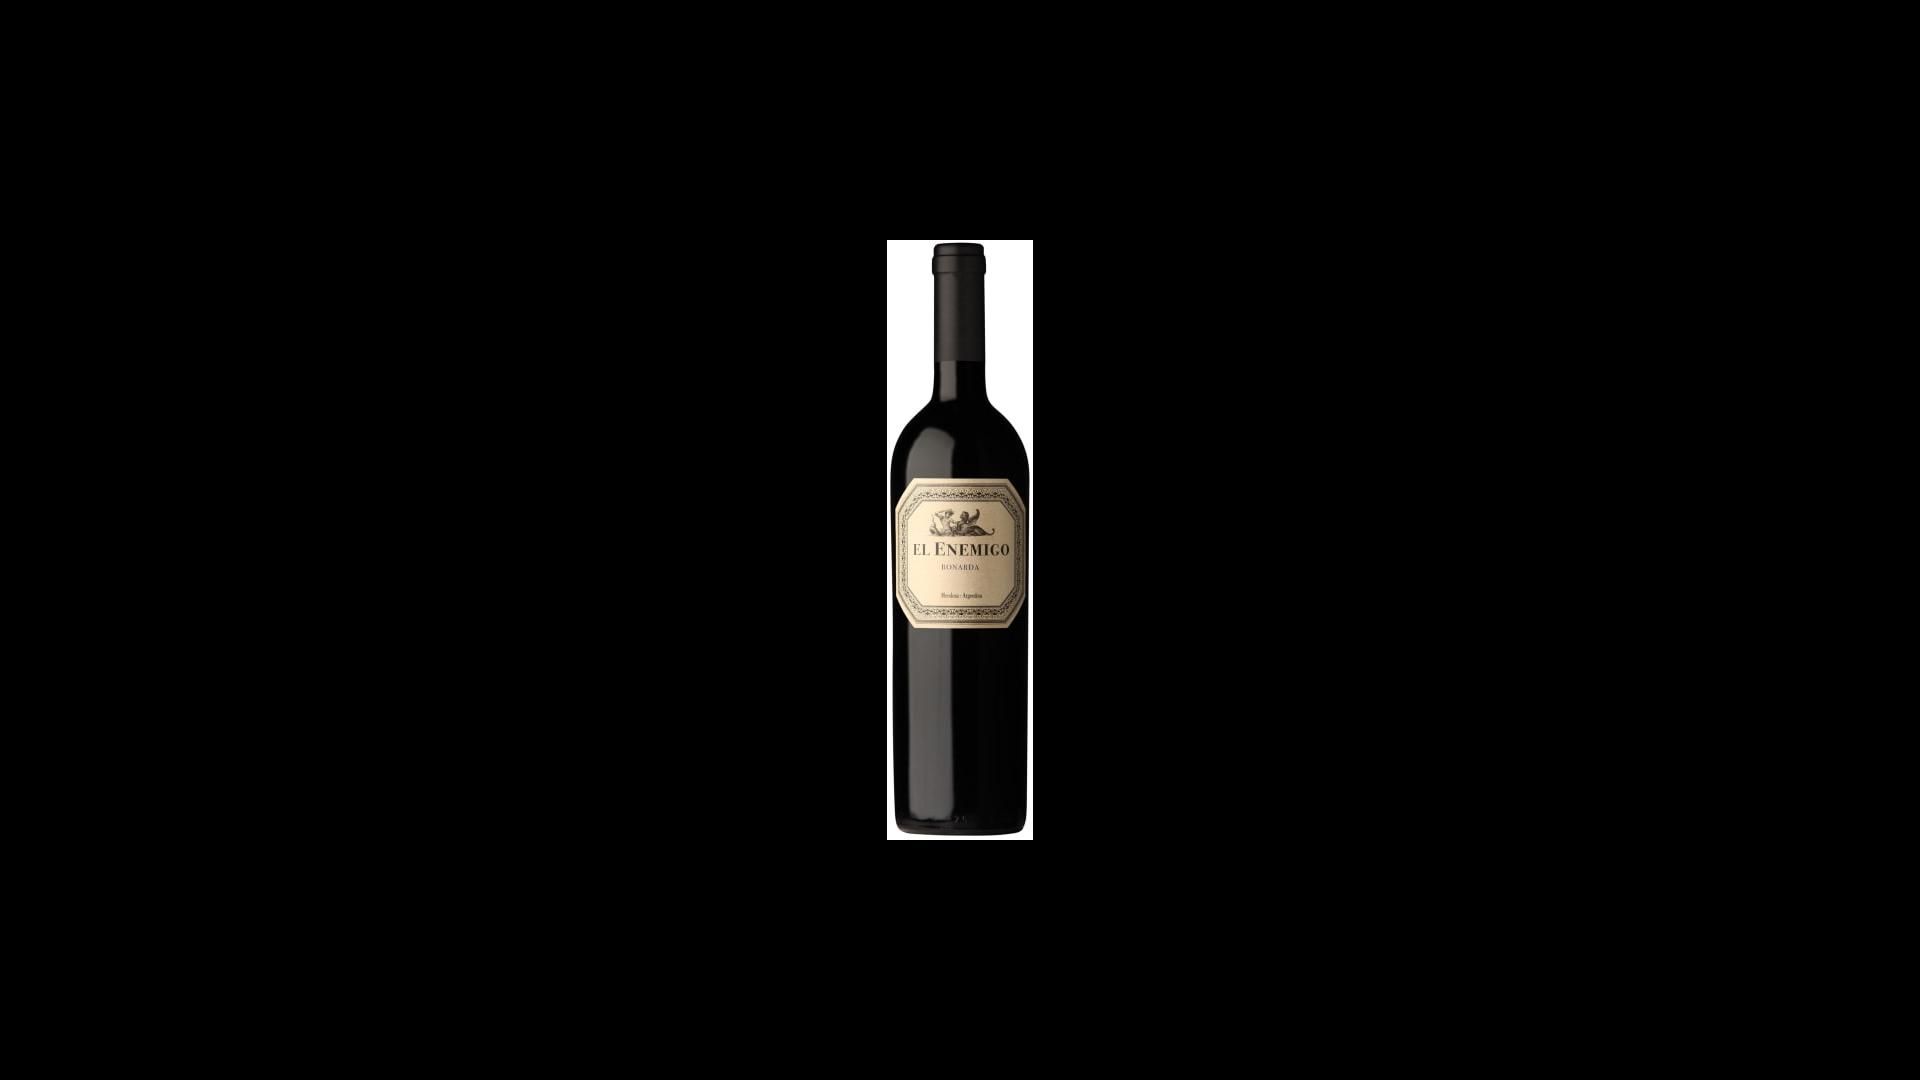 best fall wines  Bonarda 2015